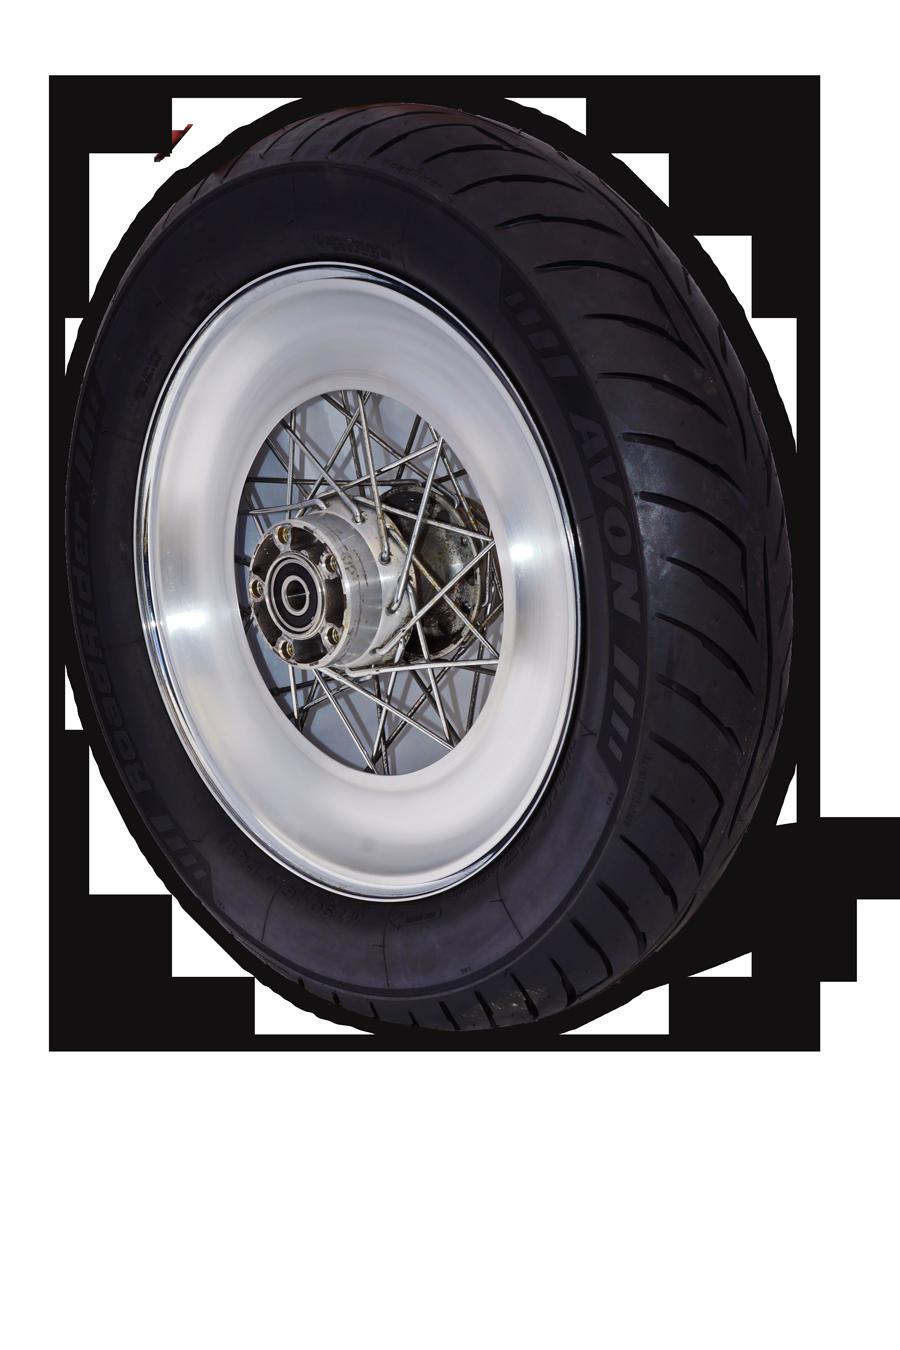 Wheel Disc Covers (Aluminum) by Pandemonium